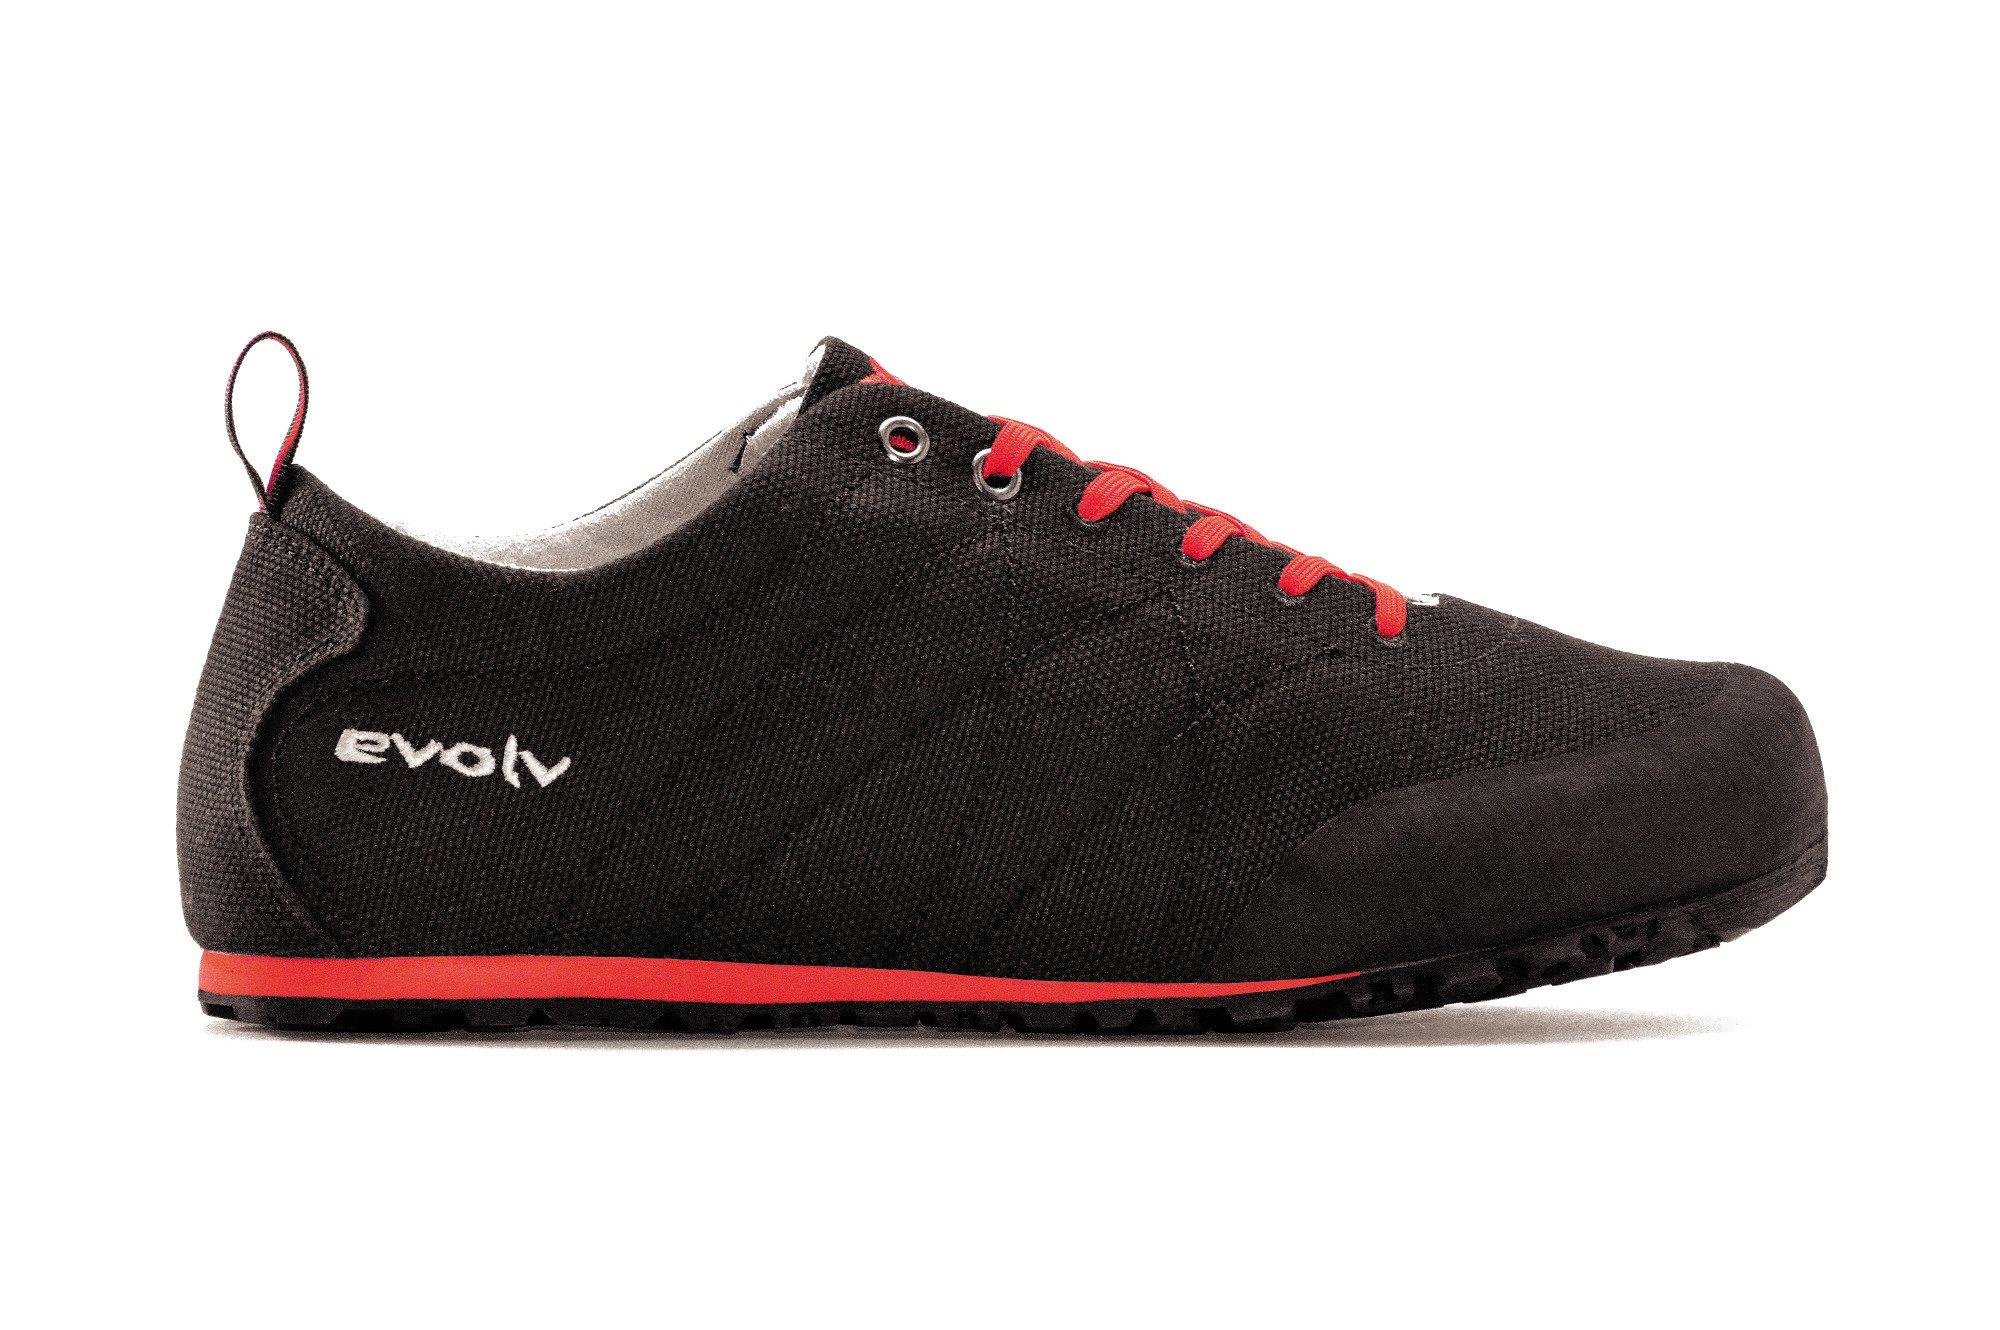 Evolv Cruzer Psyche Approach Shoe - Black 9